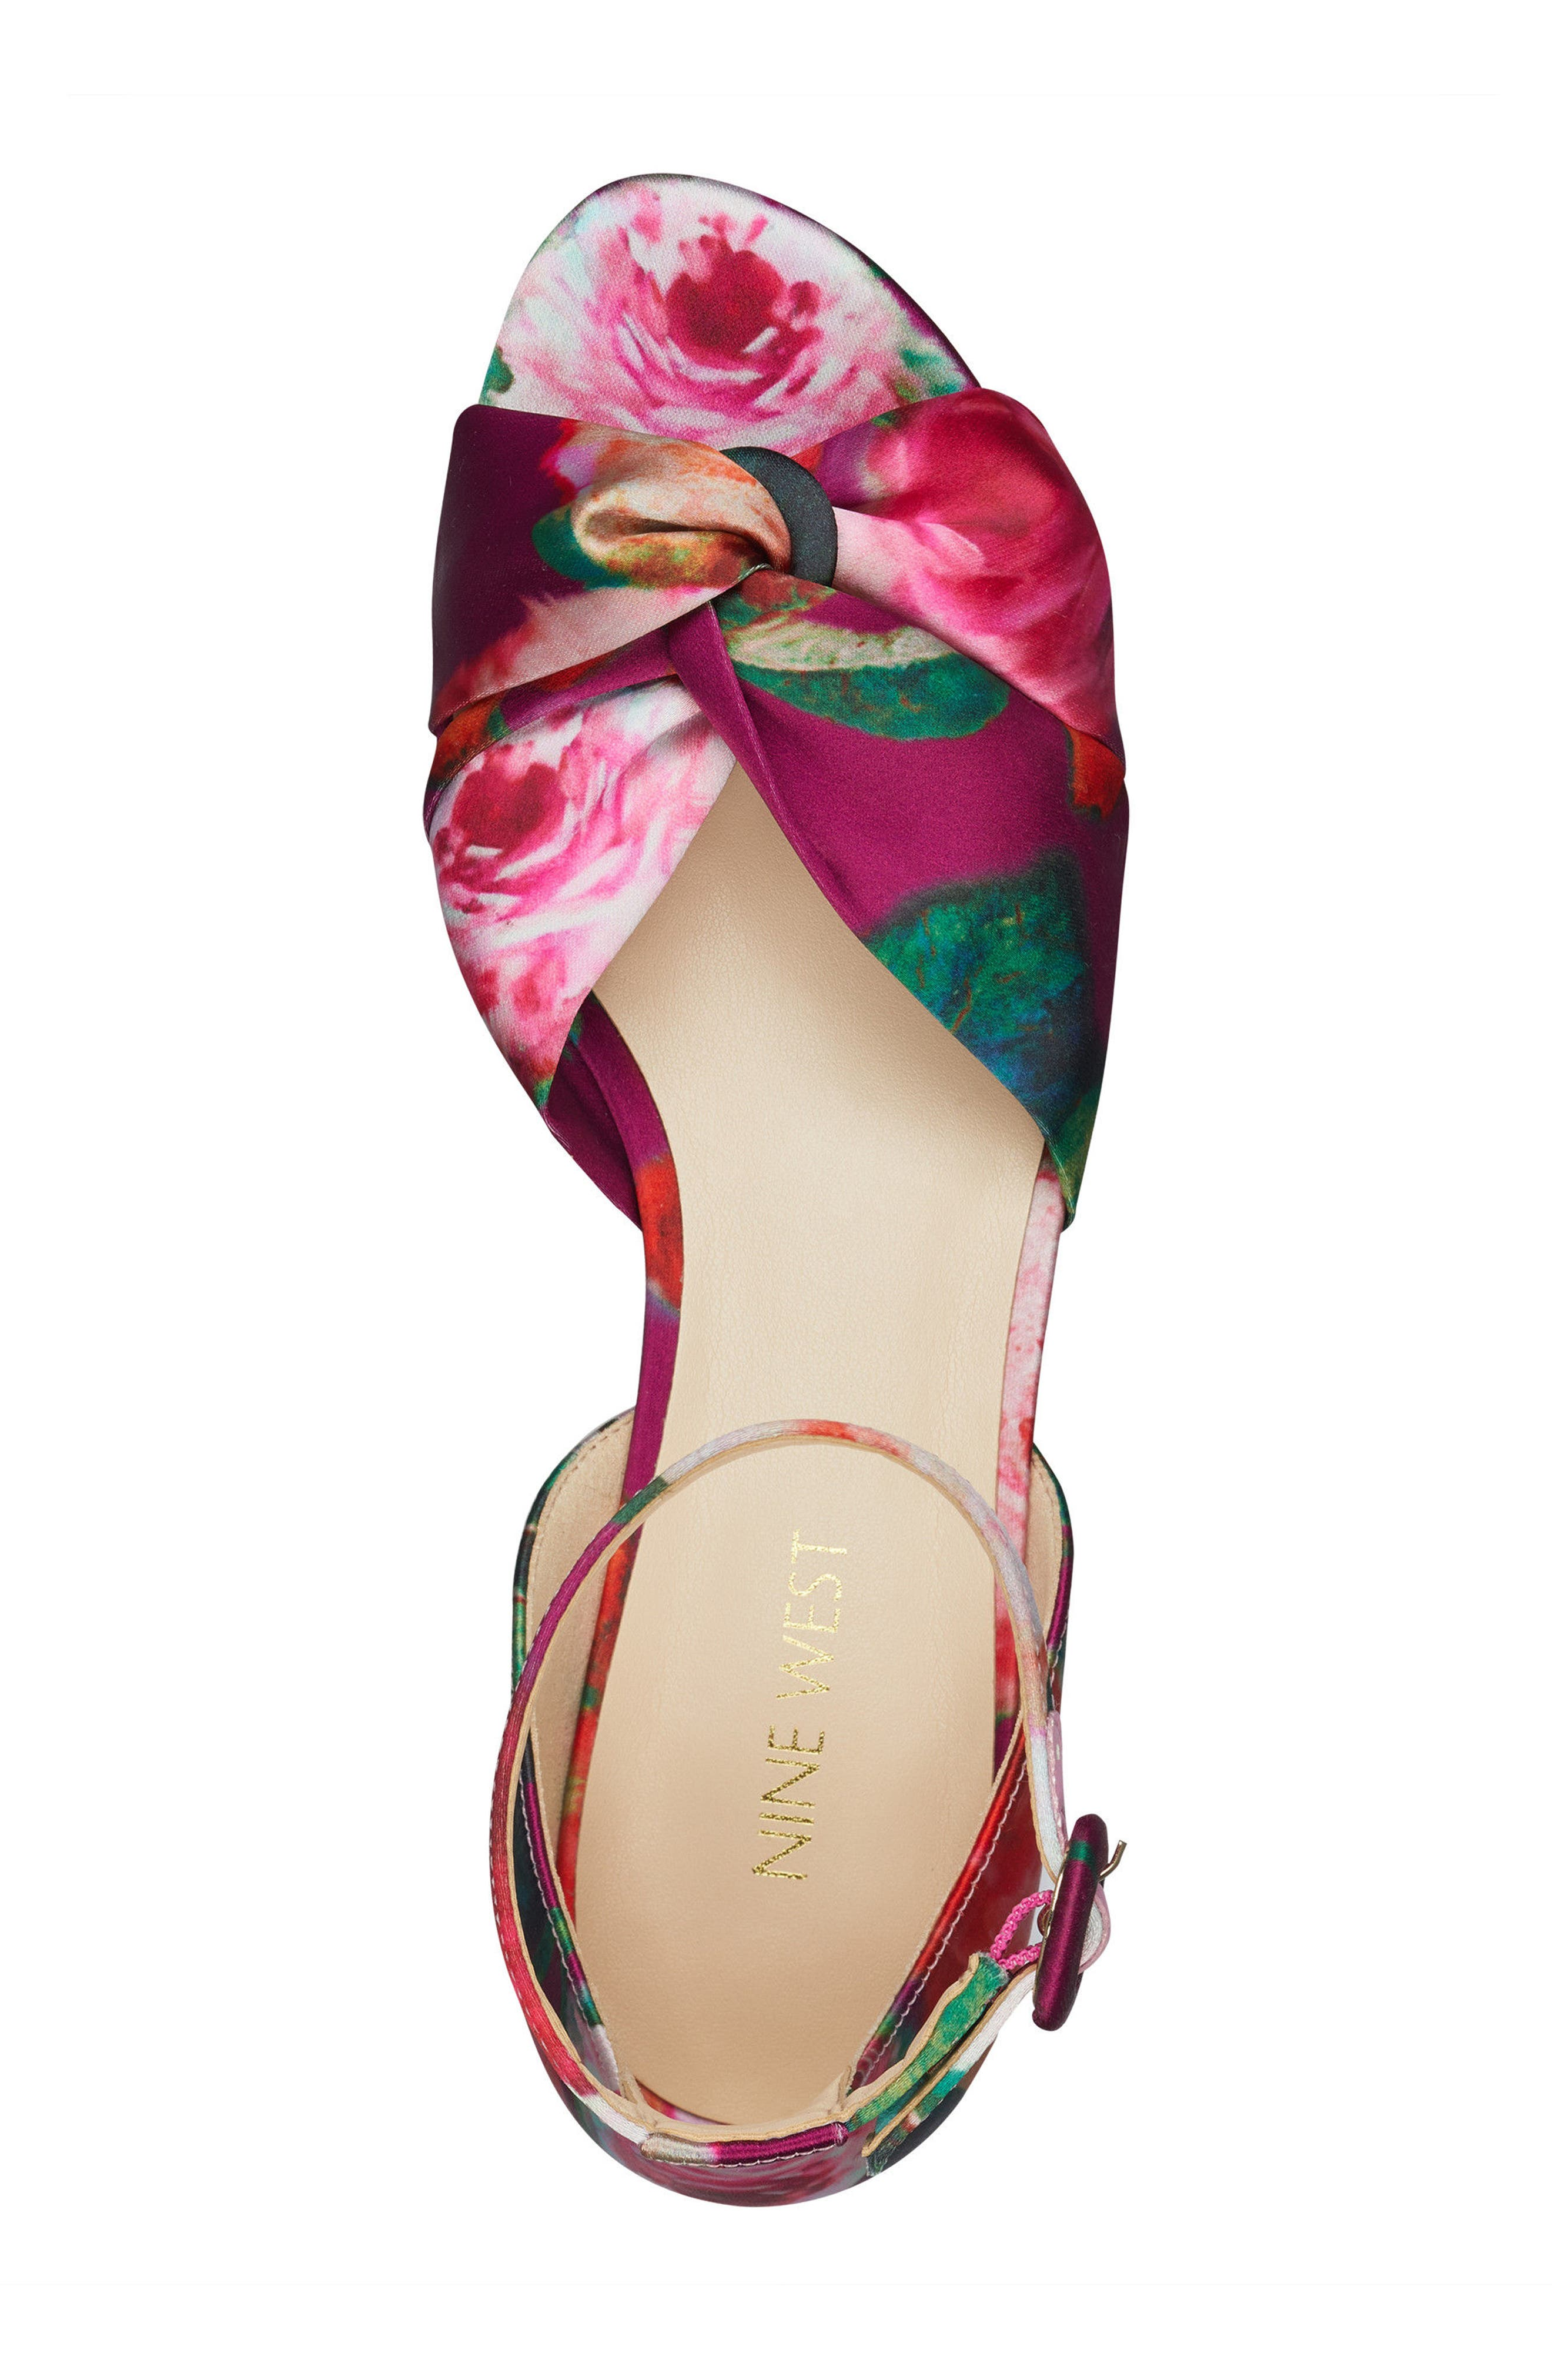 Lumsi Ankle Strap Sandal,                             Alternate thumbnail 5, color,                             Pink Multi Satin